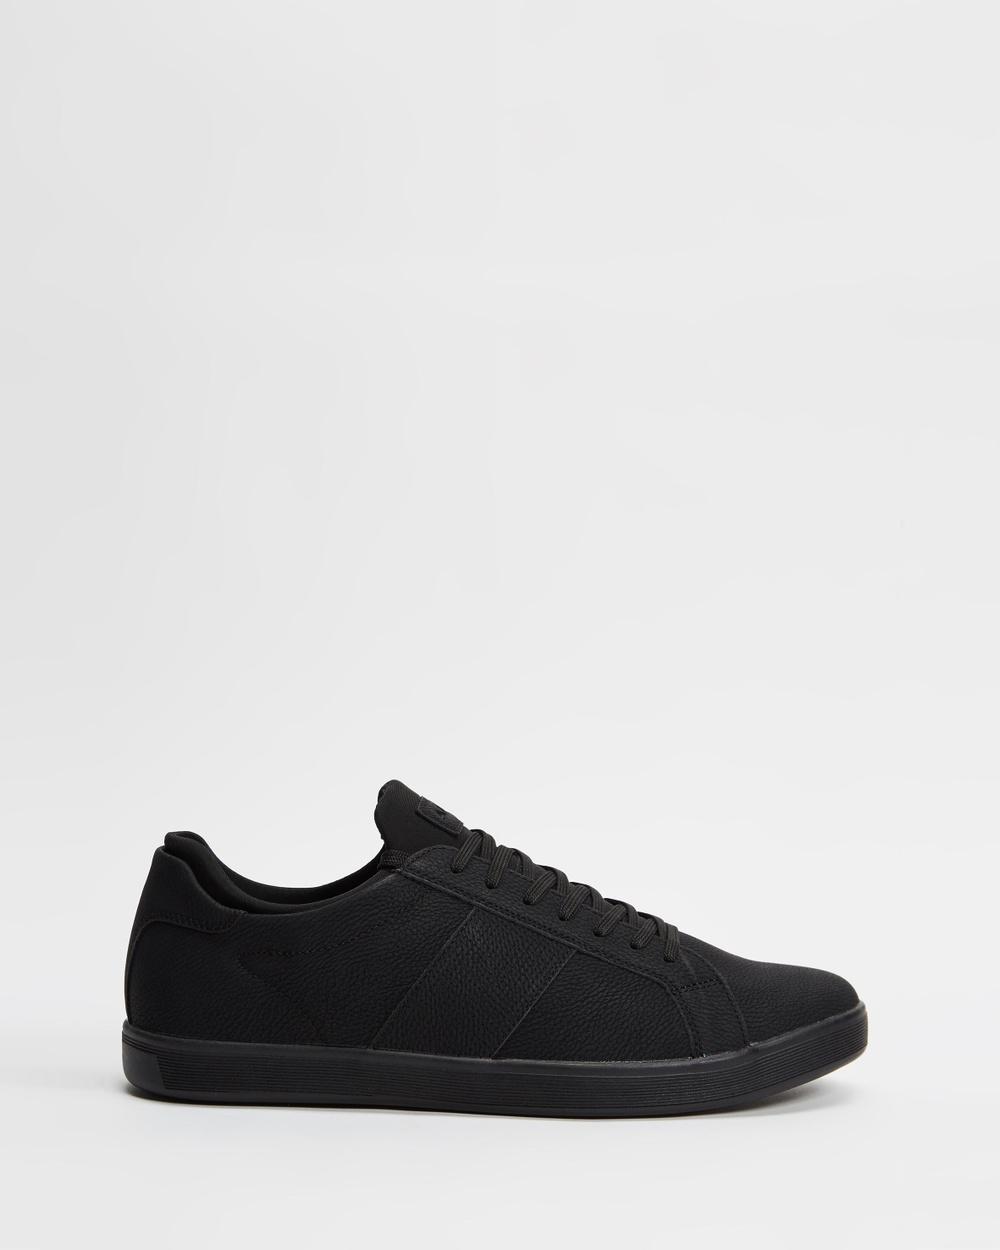 ALDO Prayrien Sneakers Black